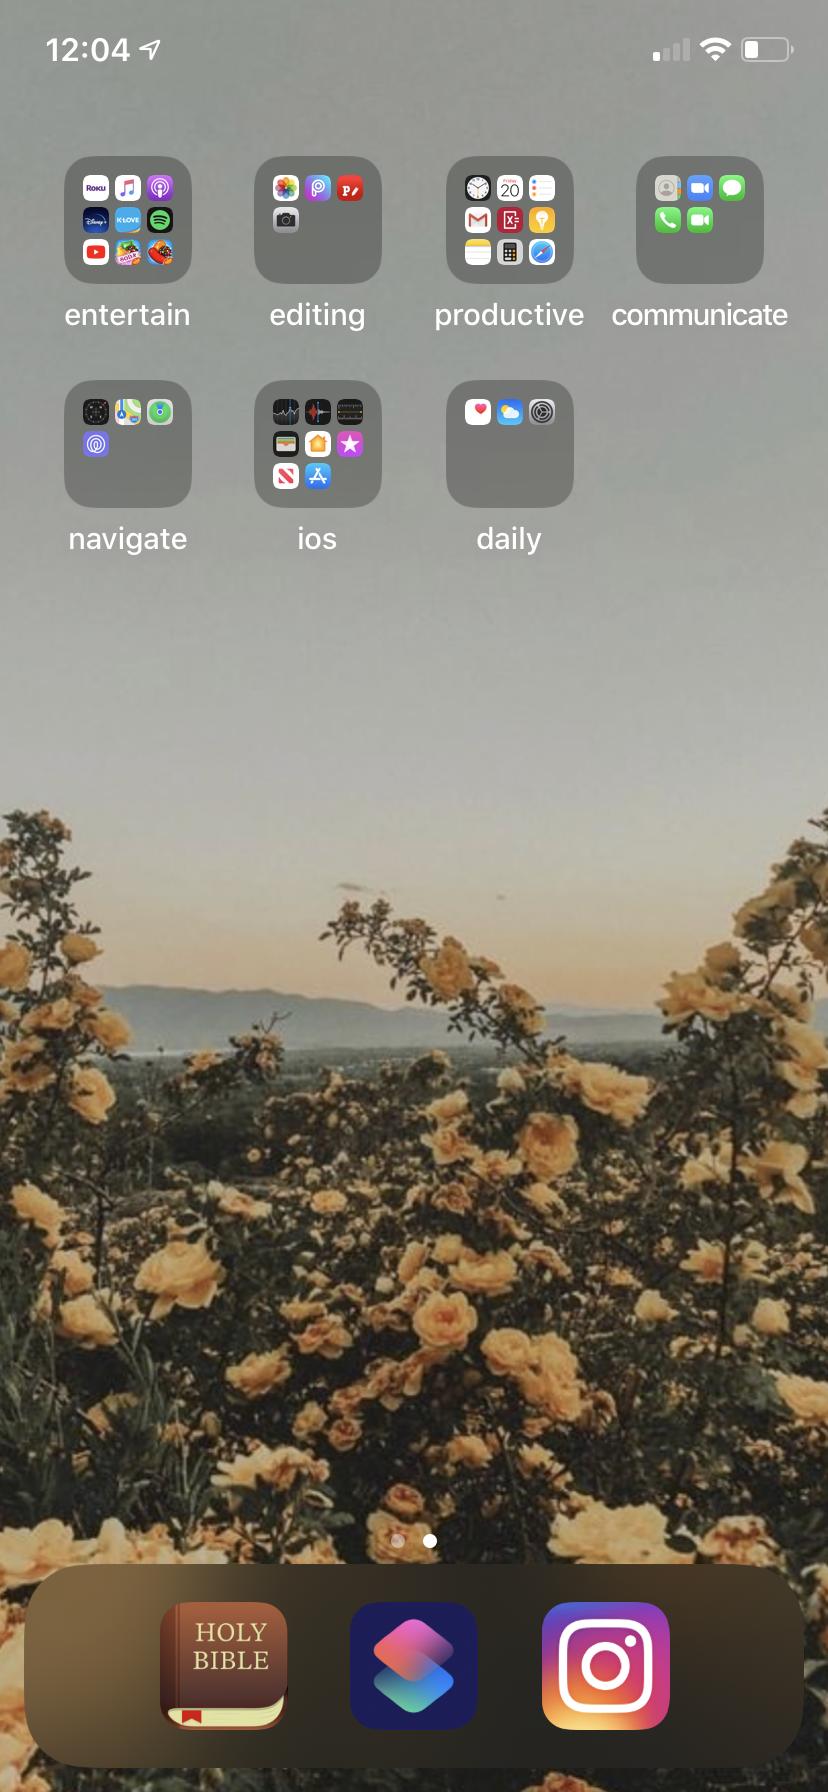 Minimalist Phone App Organization Inspiration Organize Phone Apps Iphone Organization Minimalist Phone